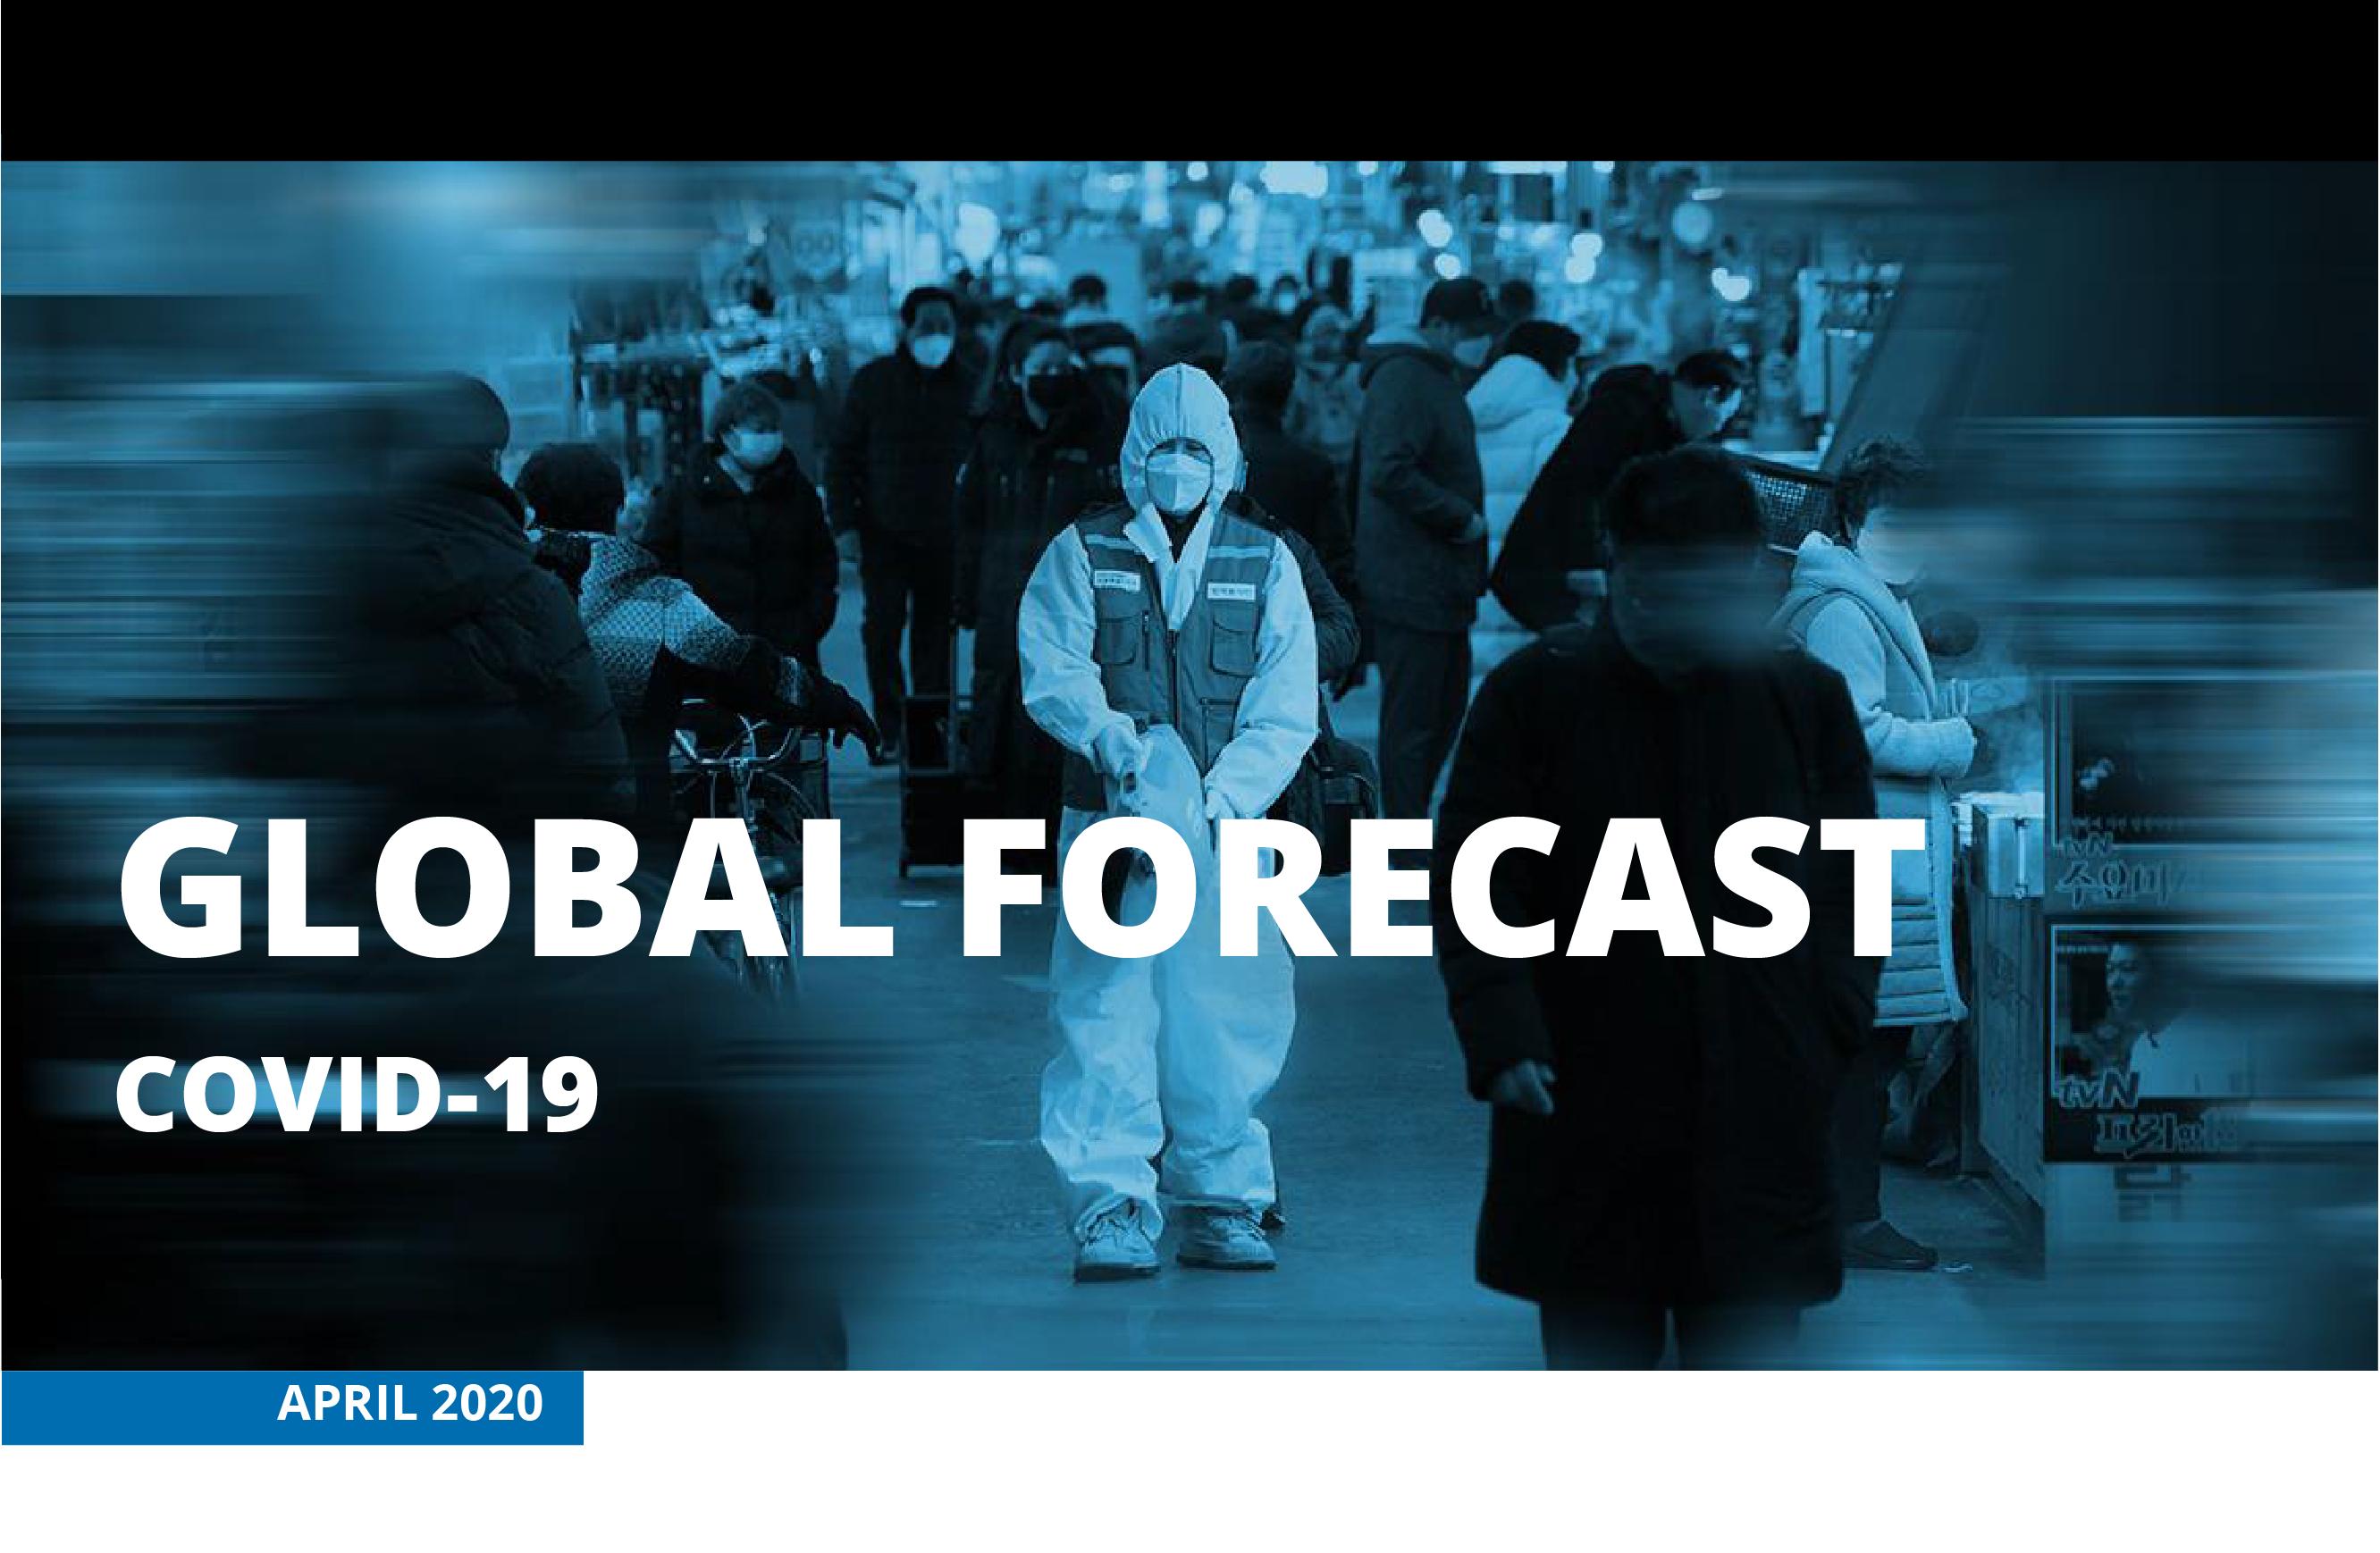 Global Forecast covid-19